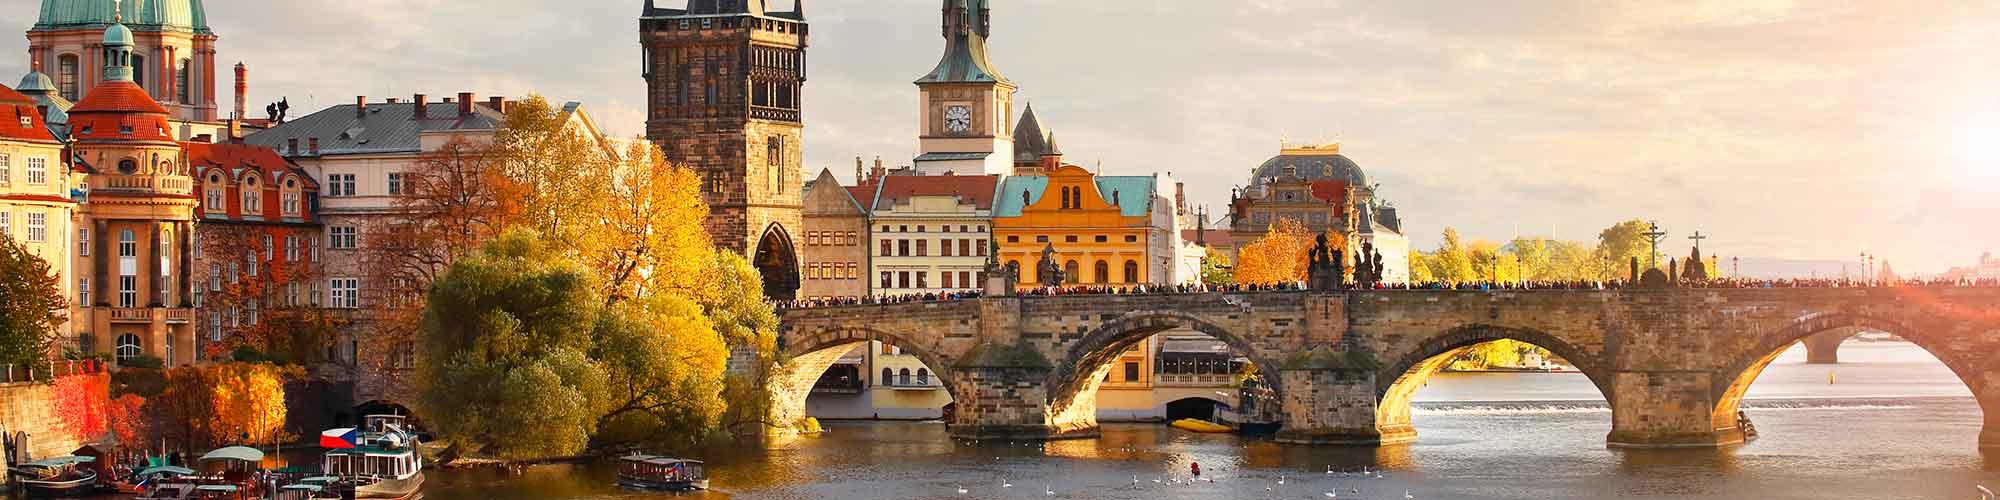 Sinfonía austro - húngara - El País Viajes